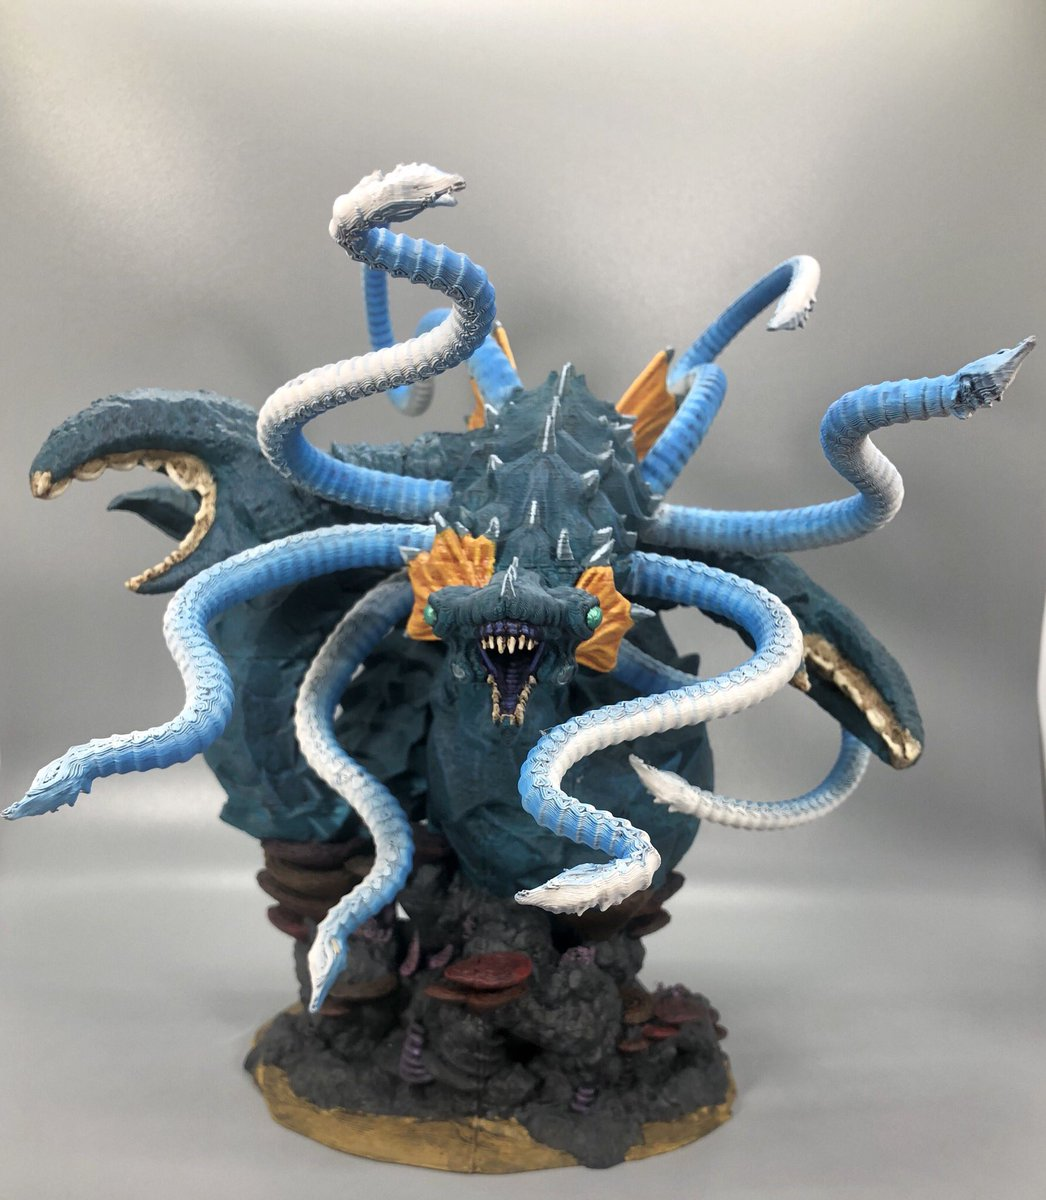 Final pics of the Kraken commission before I send it off! @Goblins_Mordor #goblinarmy #goblinpaint #miniaturepainting https://t.co/sf0Gkfe3Br